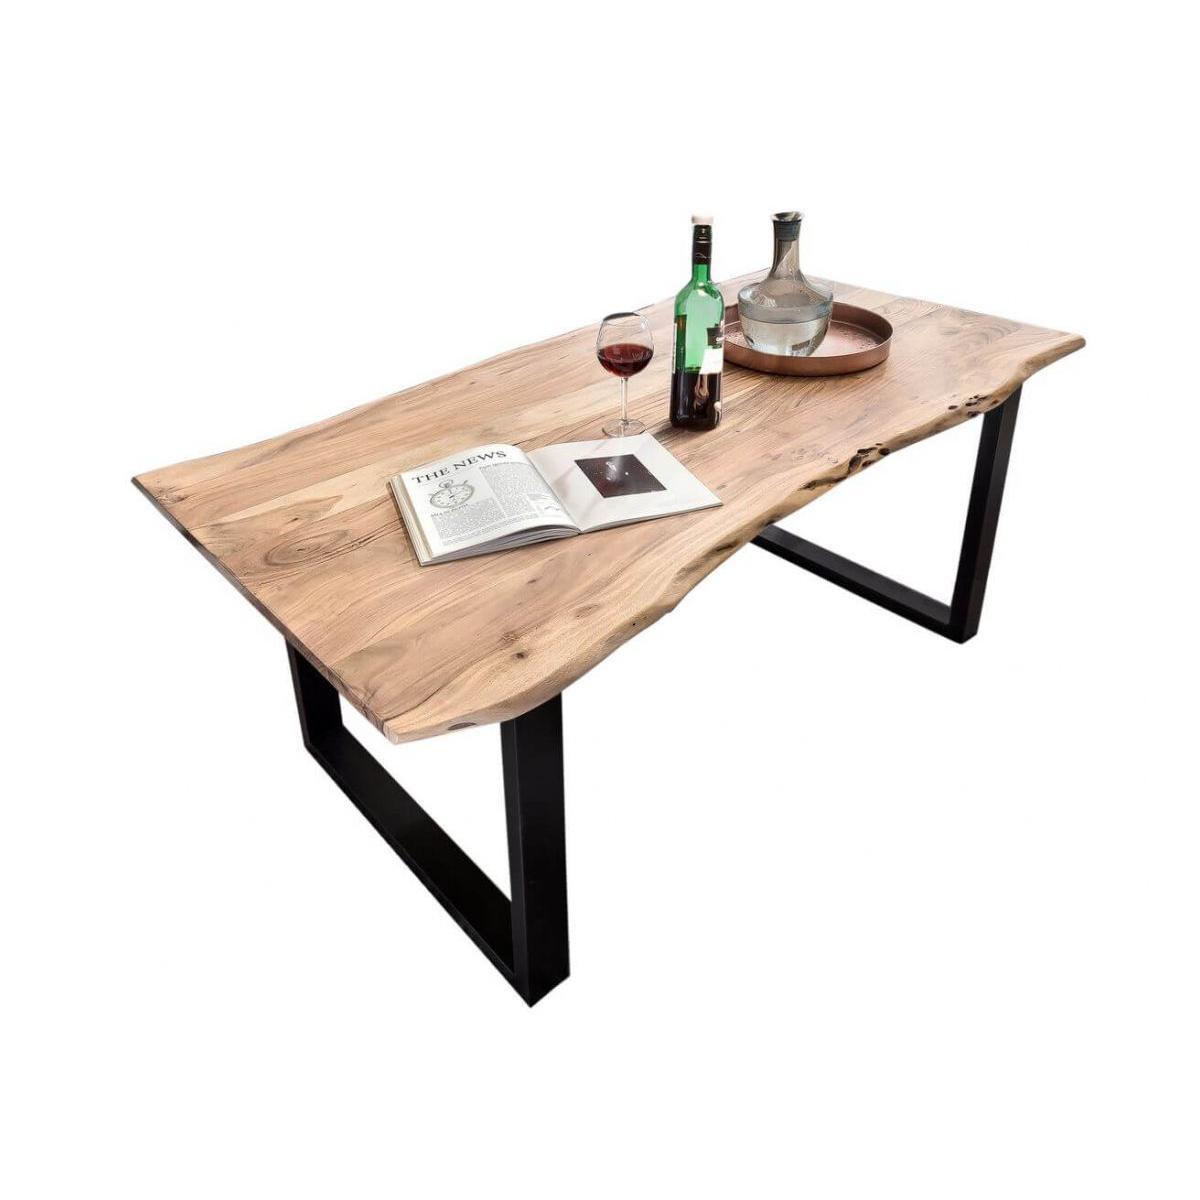 Bobochic BOBOCHIC Table 140 x 80 cm GIULIA bois massif clair